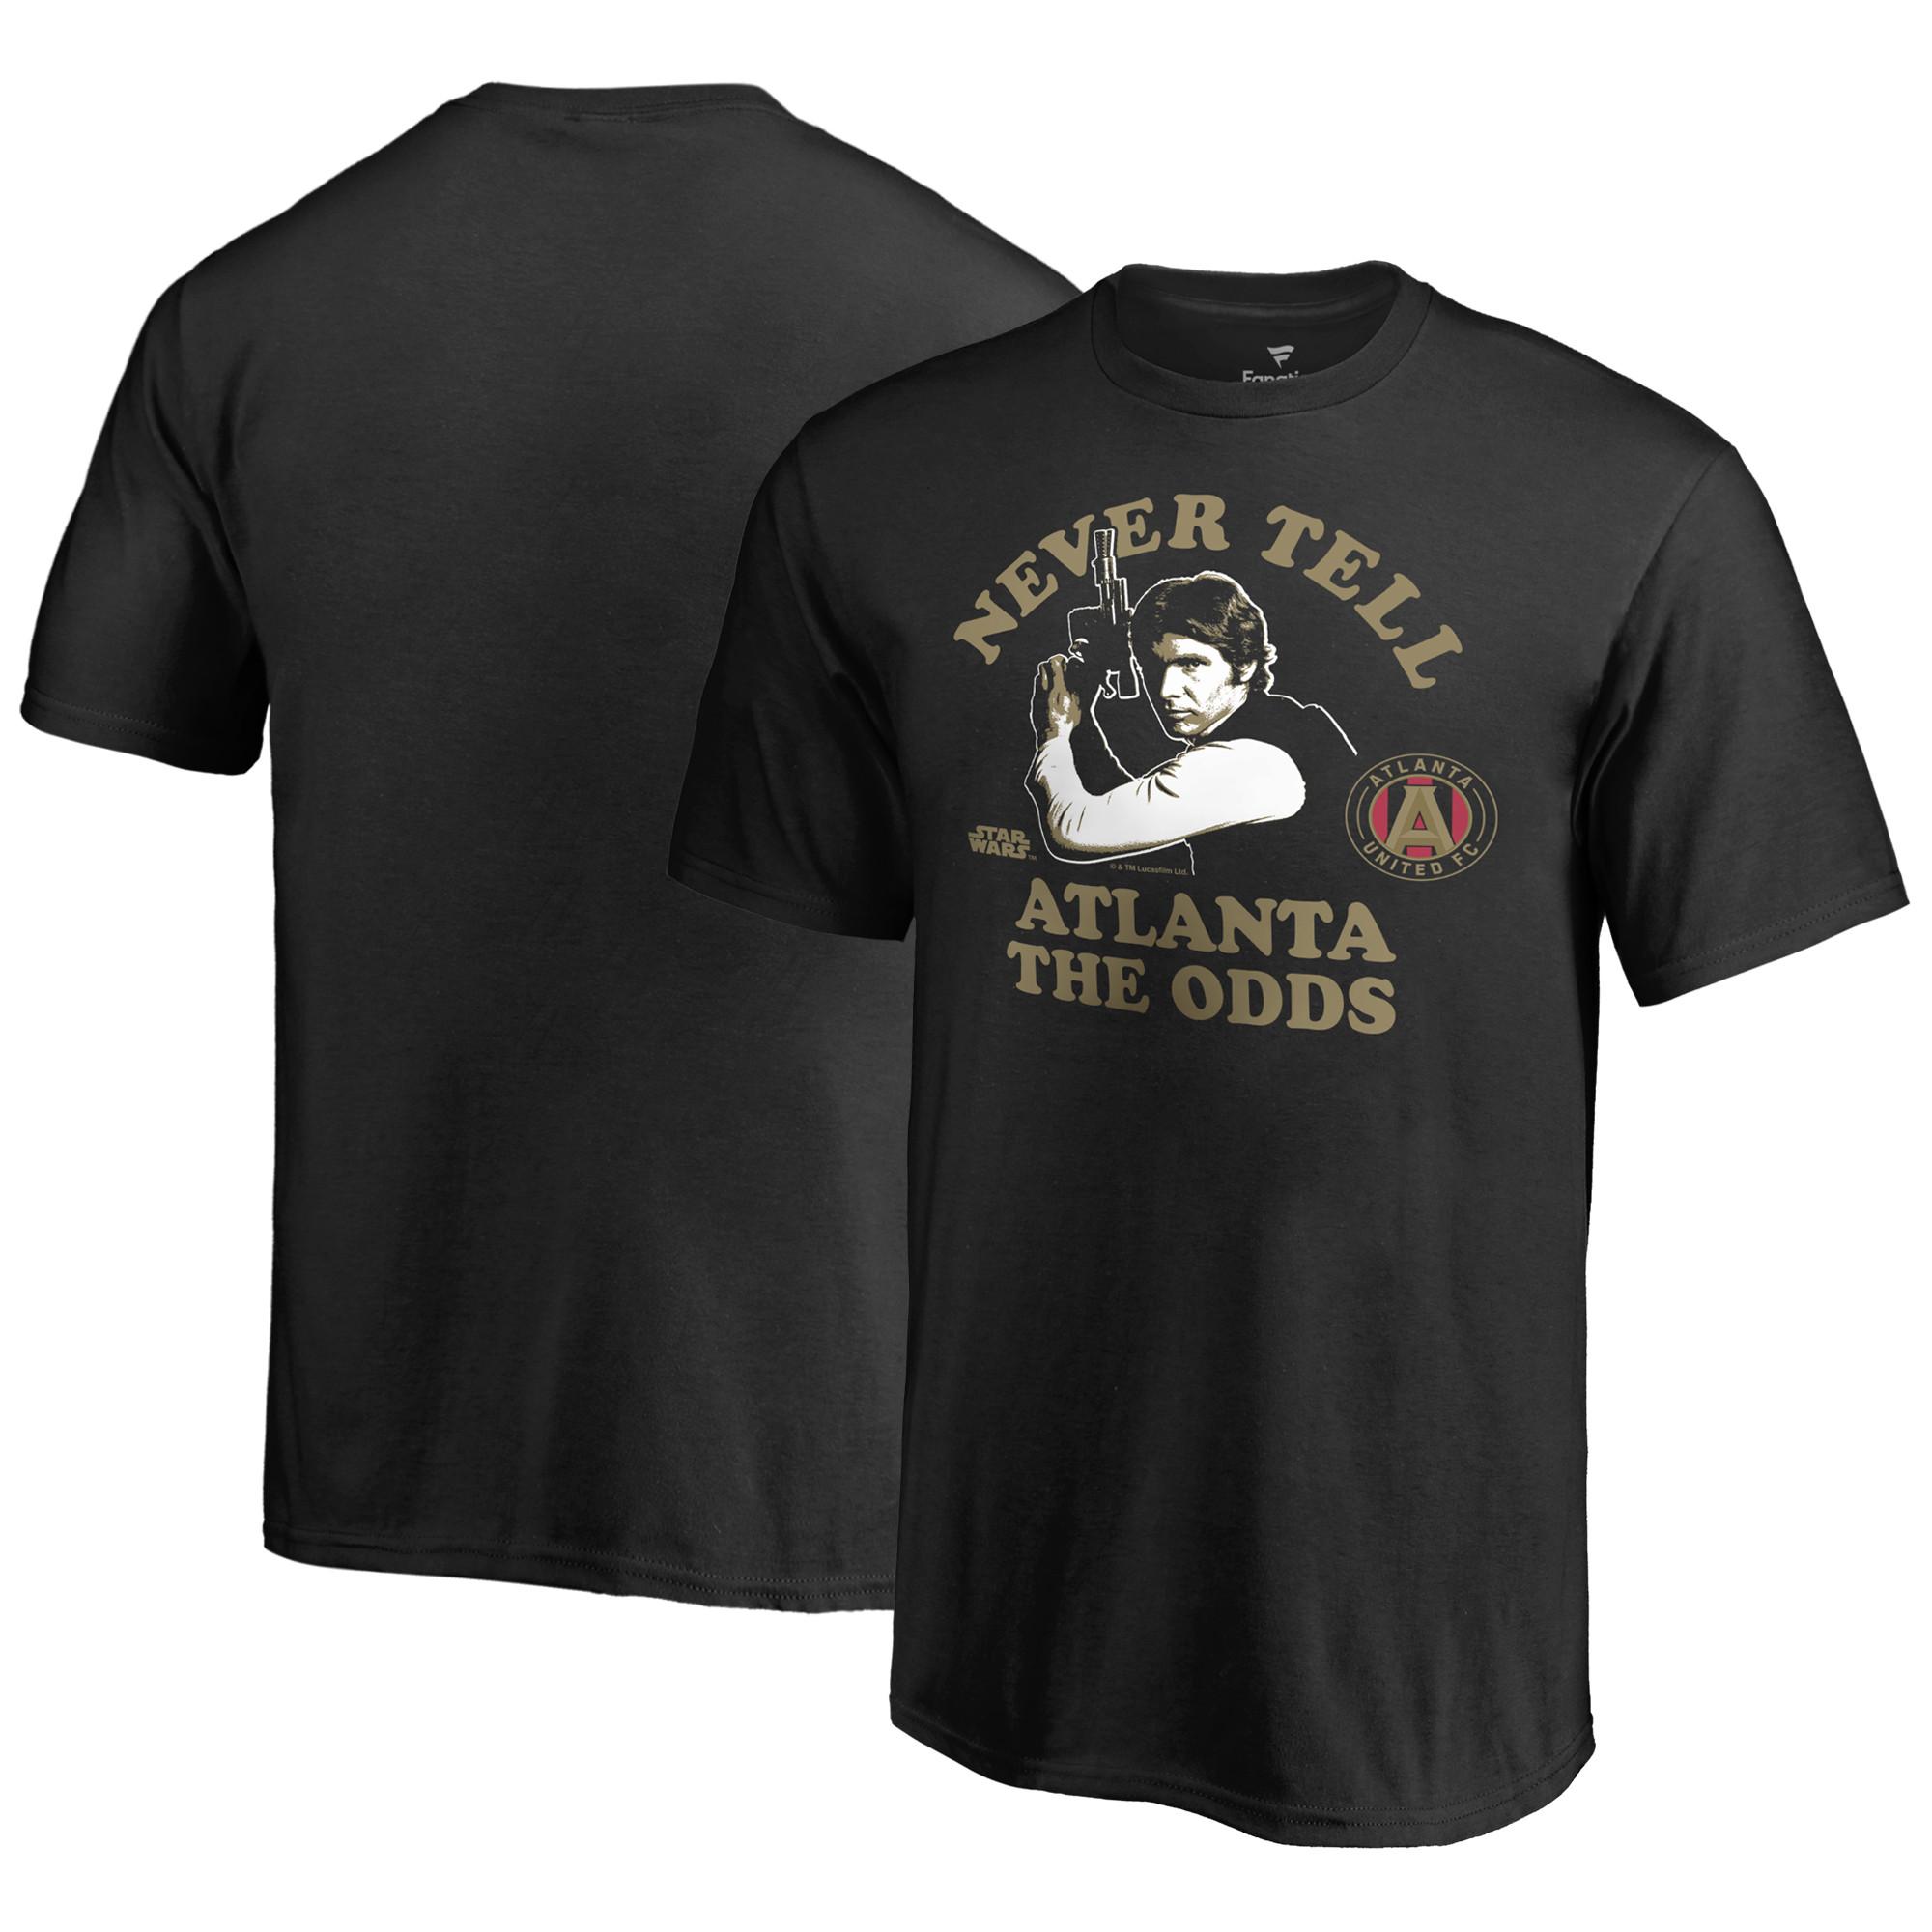 Atlanta United FC Fanatics Branded Youth Star Wars Never Tell the Odds T-Shirt - Black